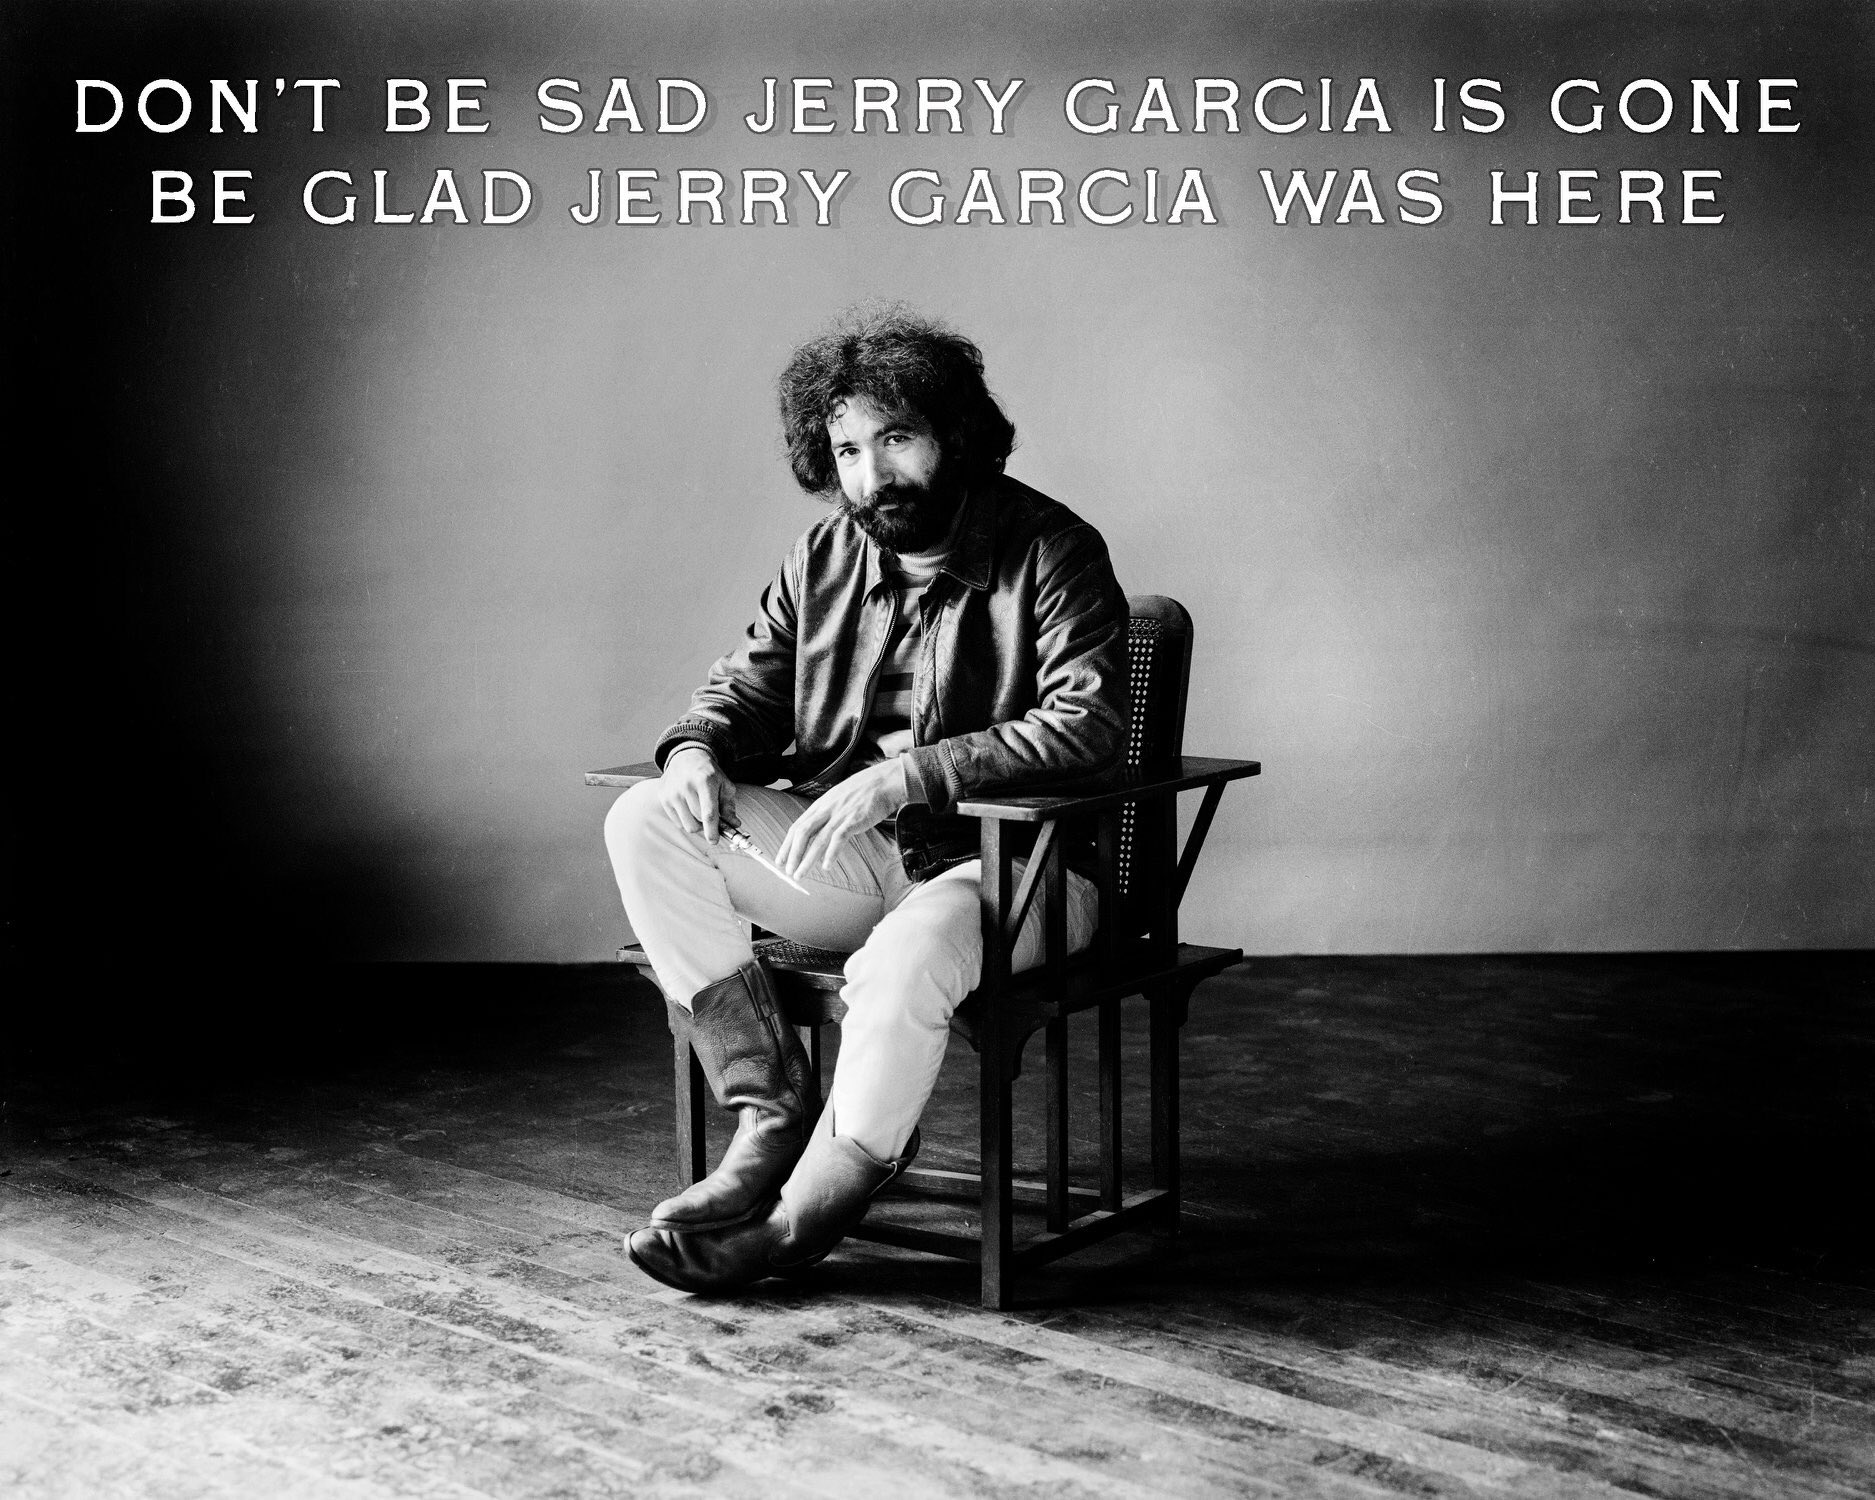 HAPPY BIRTHDAY JERRY GARCIA: Don t be sad Jerry Garcia is gone, be glad Jerry Garcia was here.